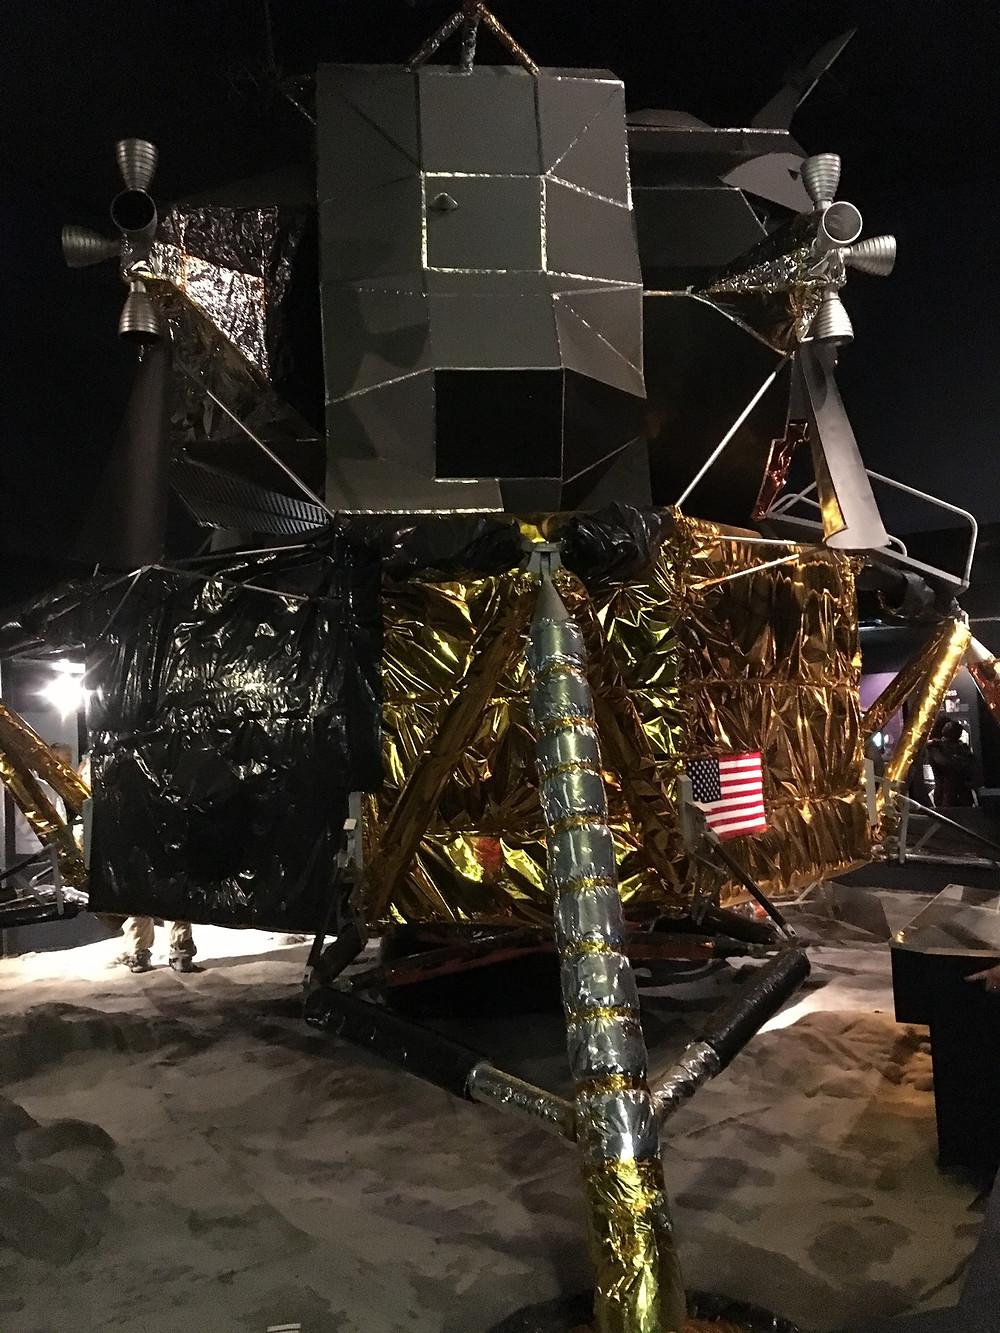 Moon lander, Chronicle Digital Storytelling